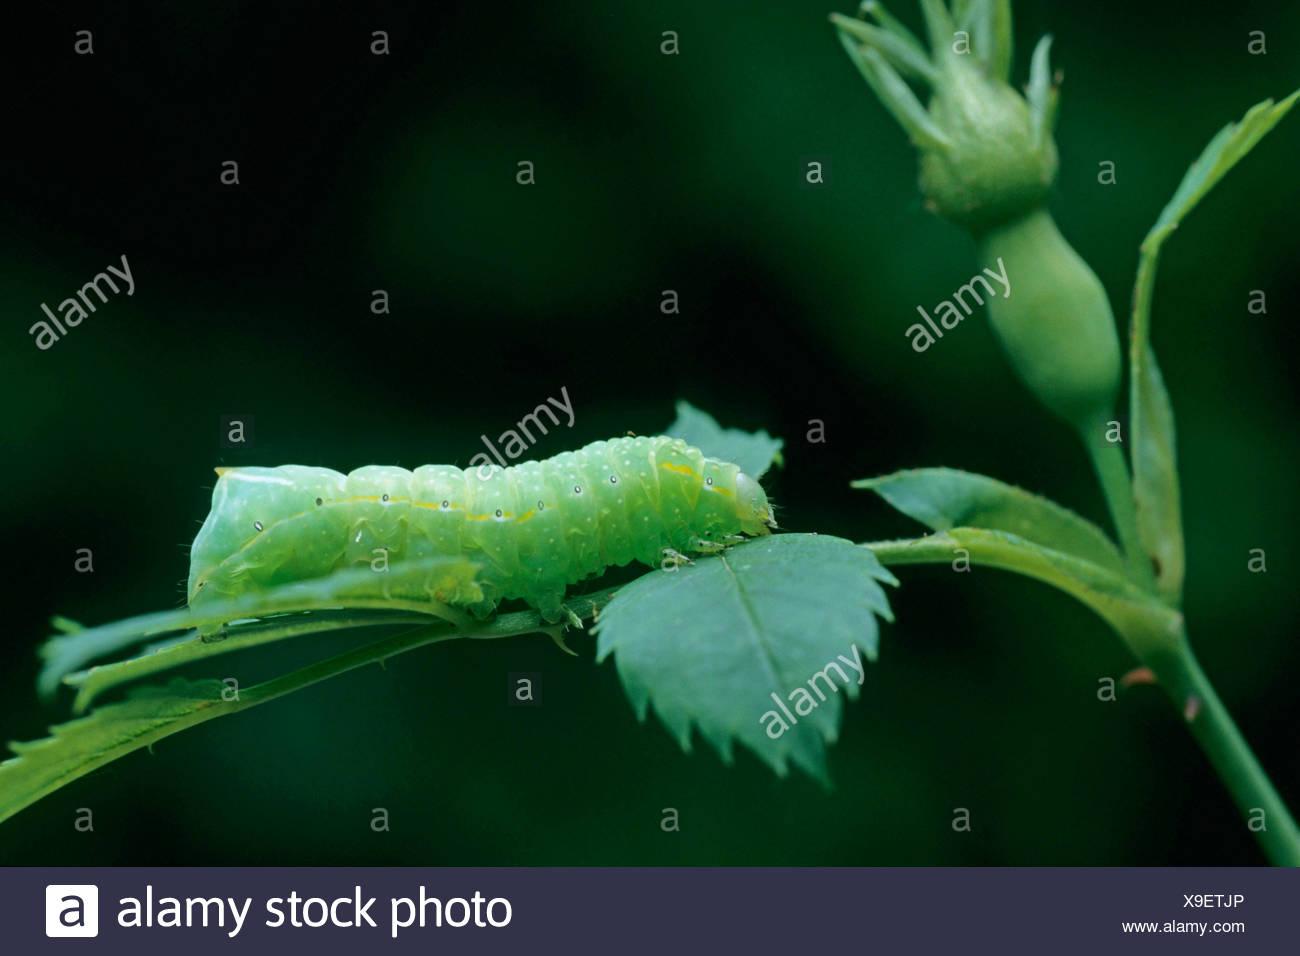 Kupfer-Underwing, bucklig grün Fruitworm, pyramidalen Green Fruitworm (Amphipyra Pyramidea), an einem Stiel Stockbild